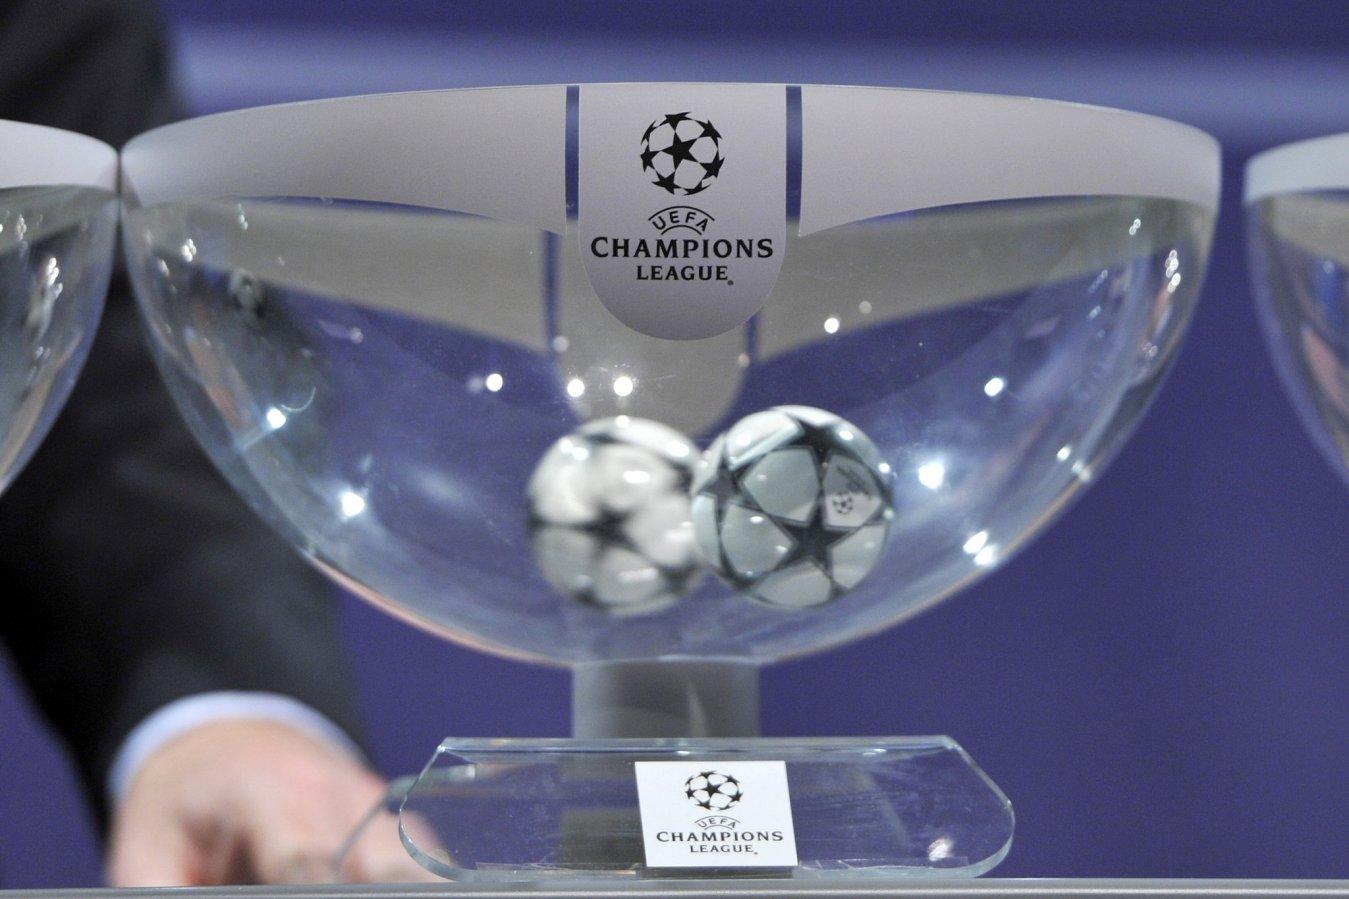 Sorteggio Champions 2021/22 - Diretta Canale 20 Mediaset, Sky Sport, Amazon Prime Video